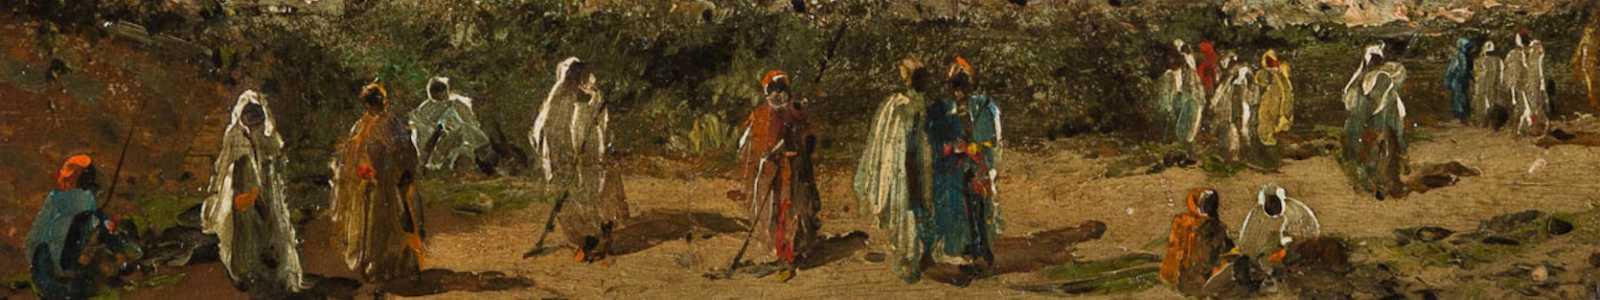 Paintings of the 19th century. Century,